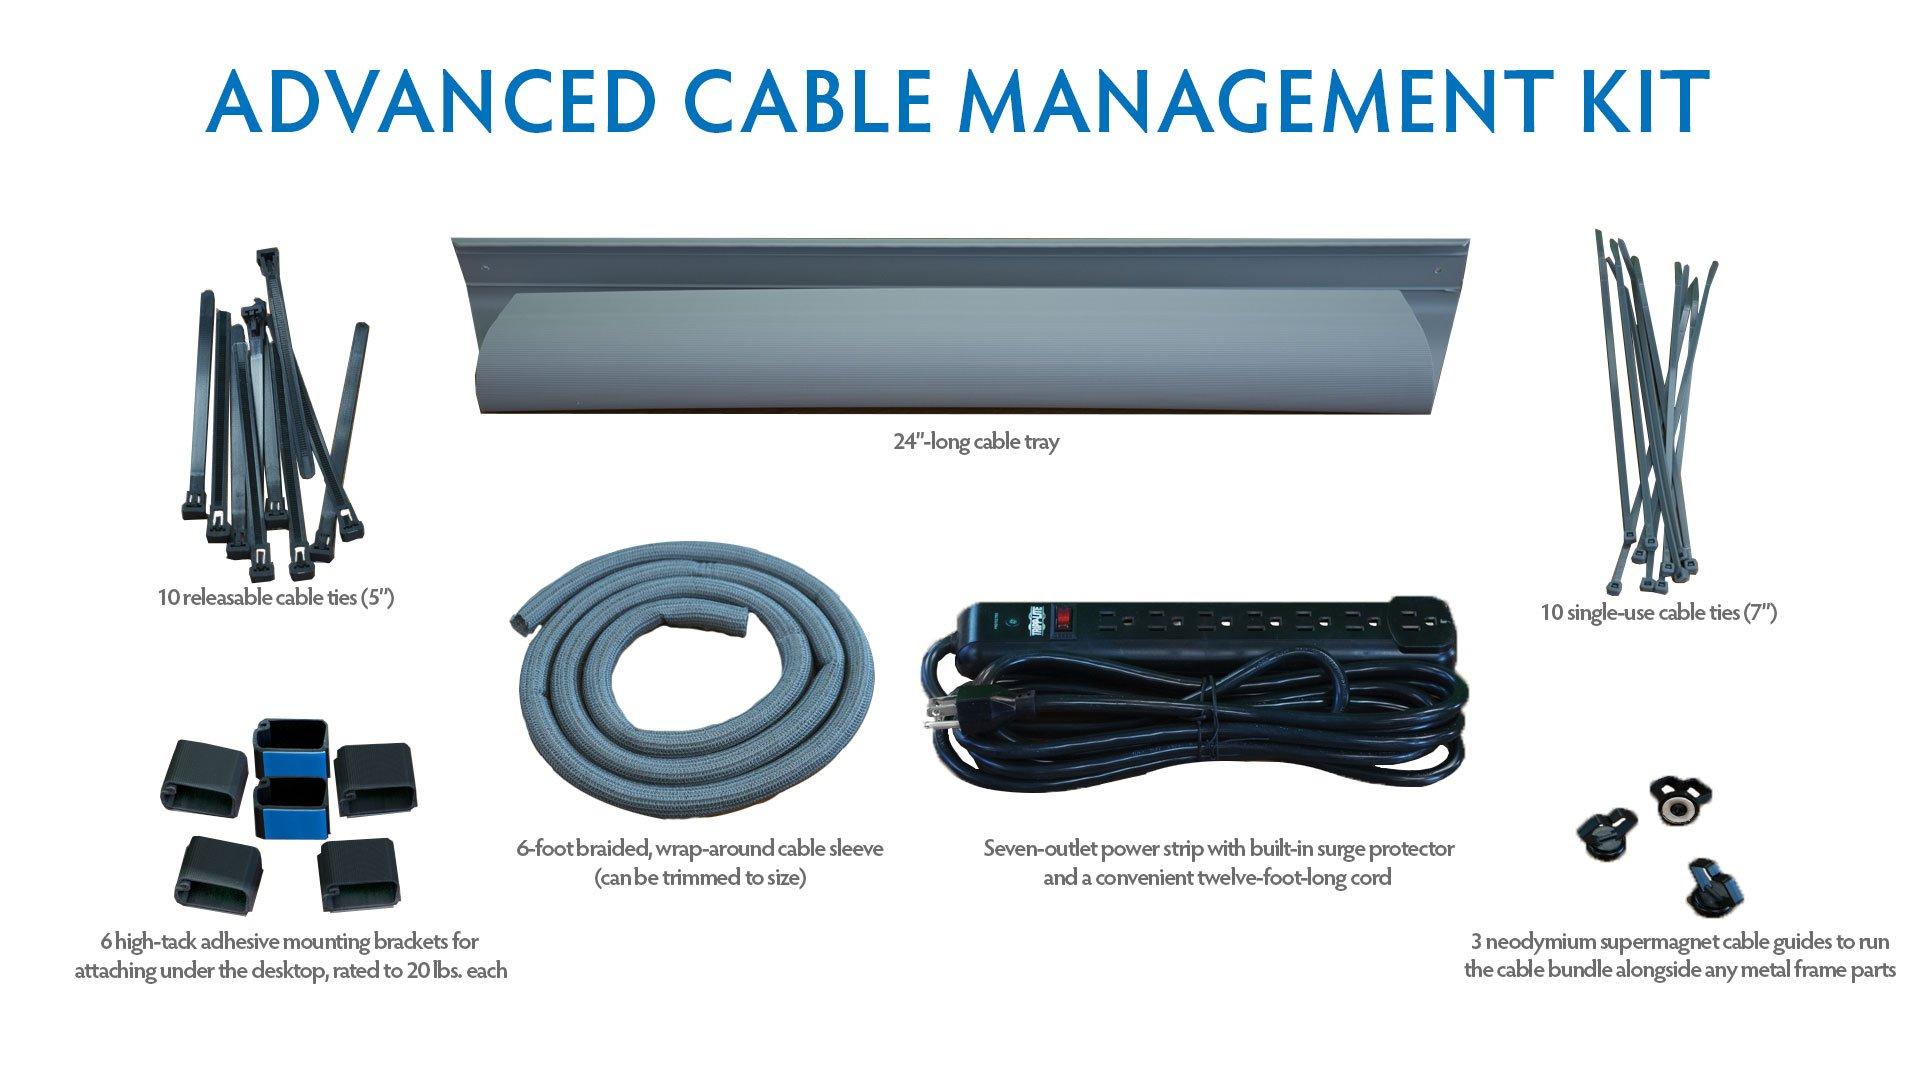 iMovR Cable Management Kit for Standing Desk (Advanced Kit, Silver)